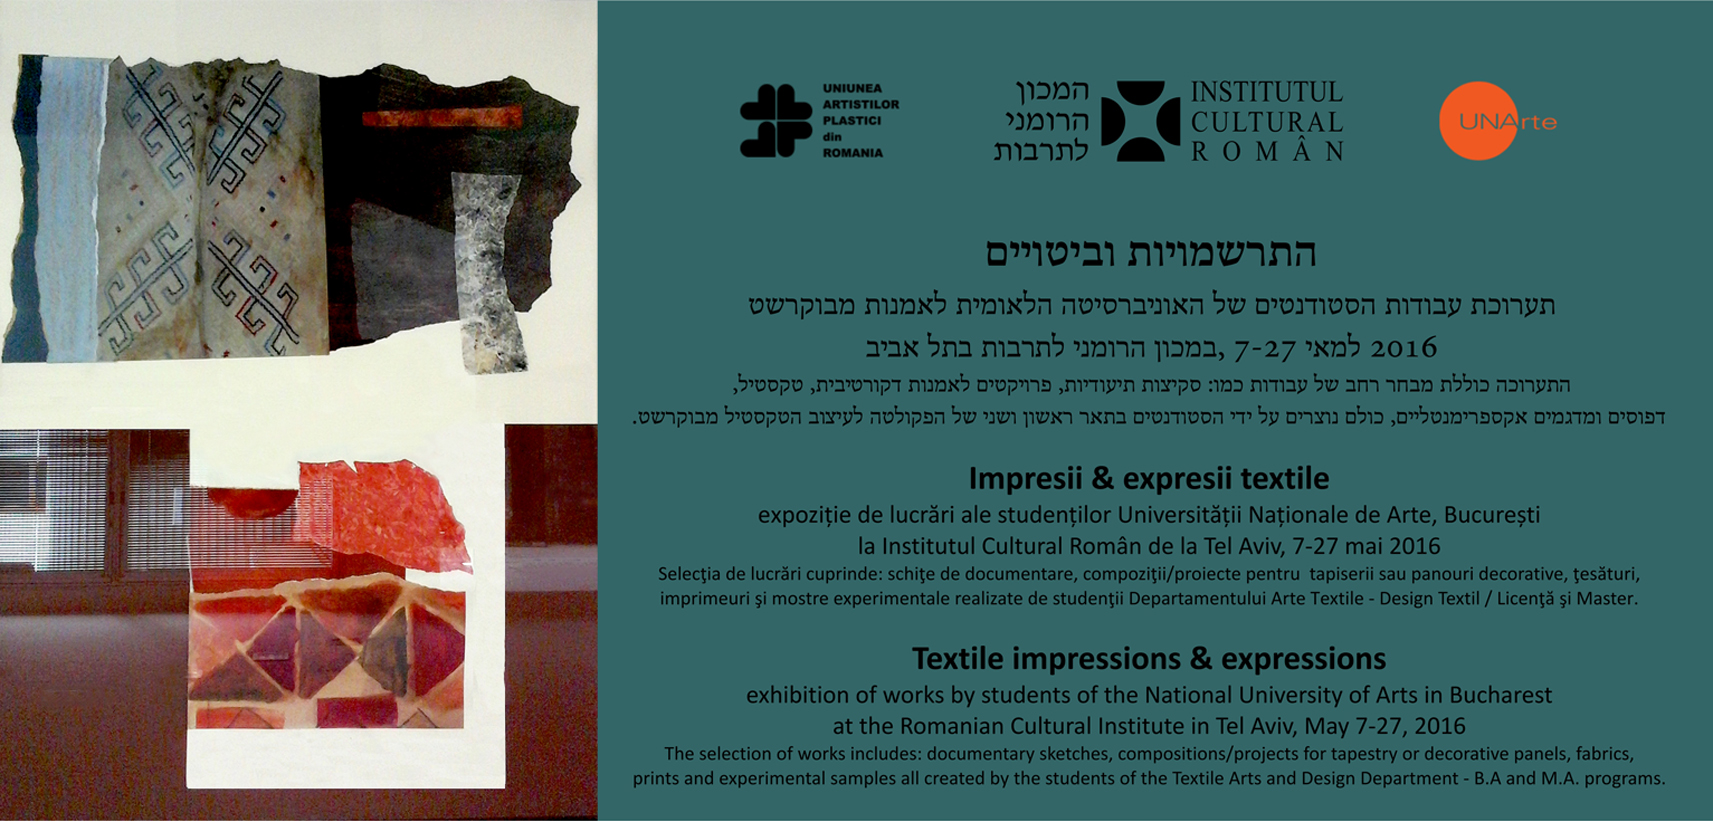 Impresii & expresii textile ICR , Tel Aviv